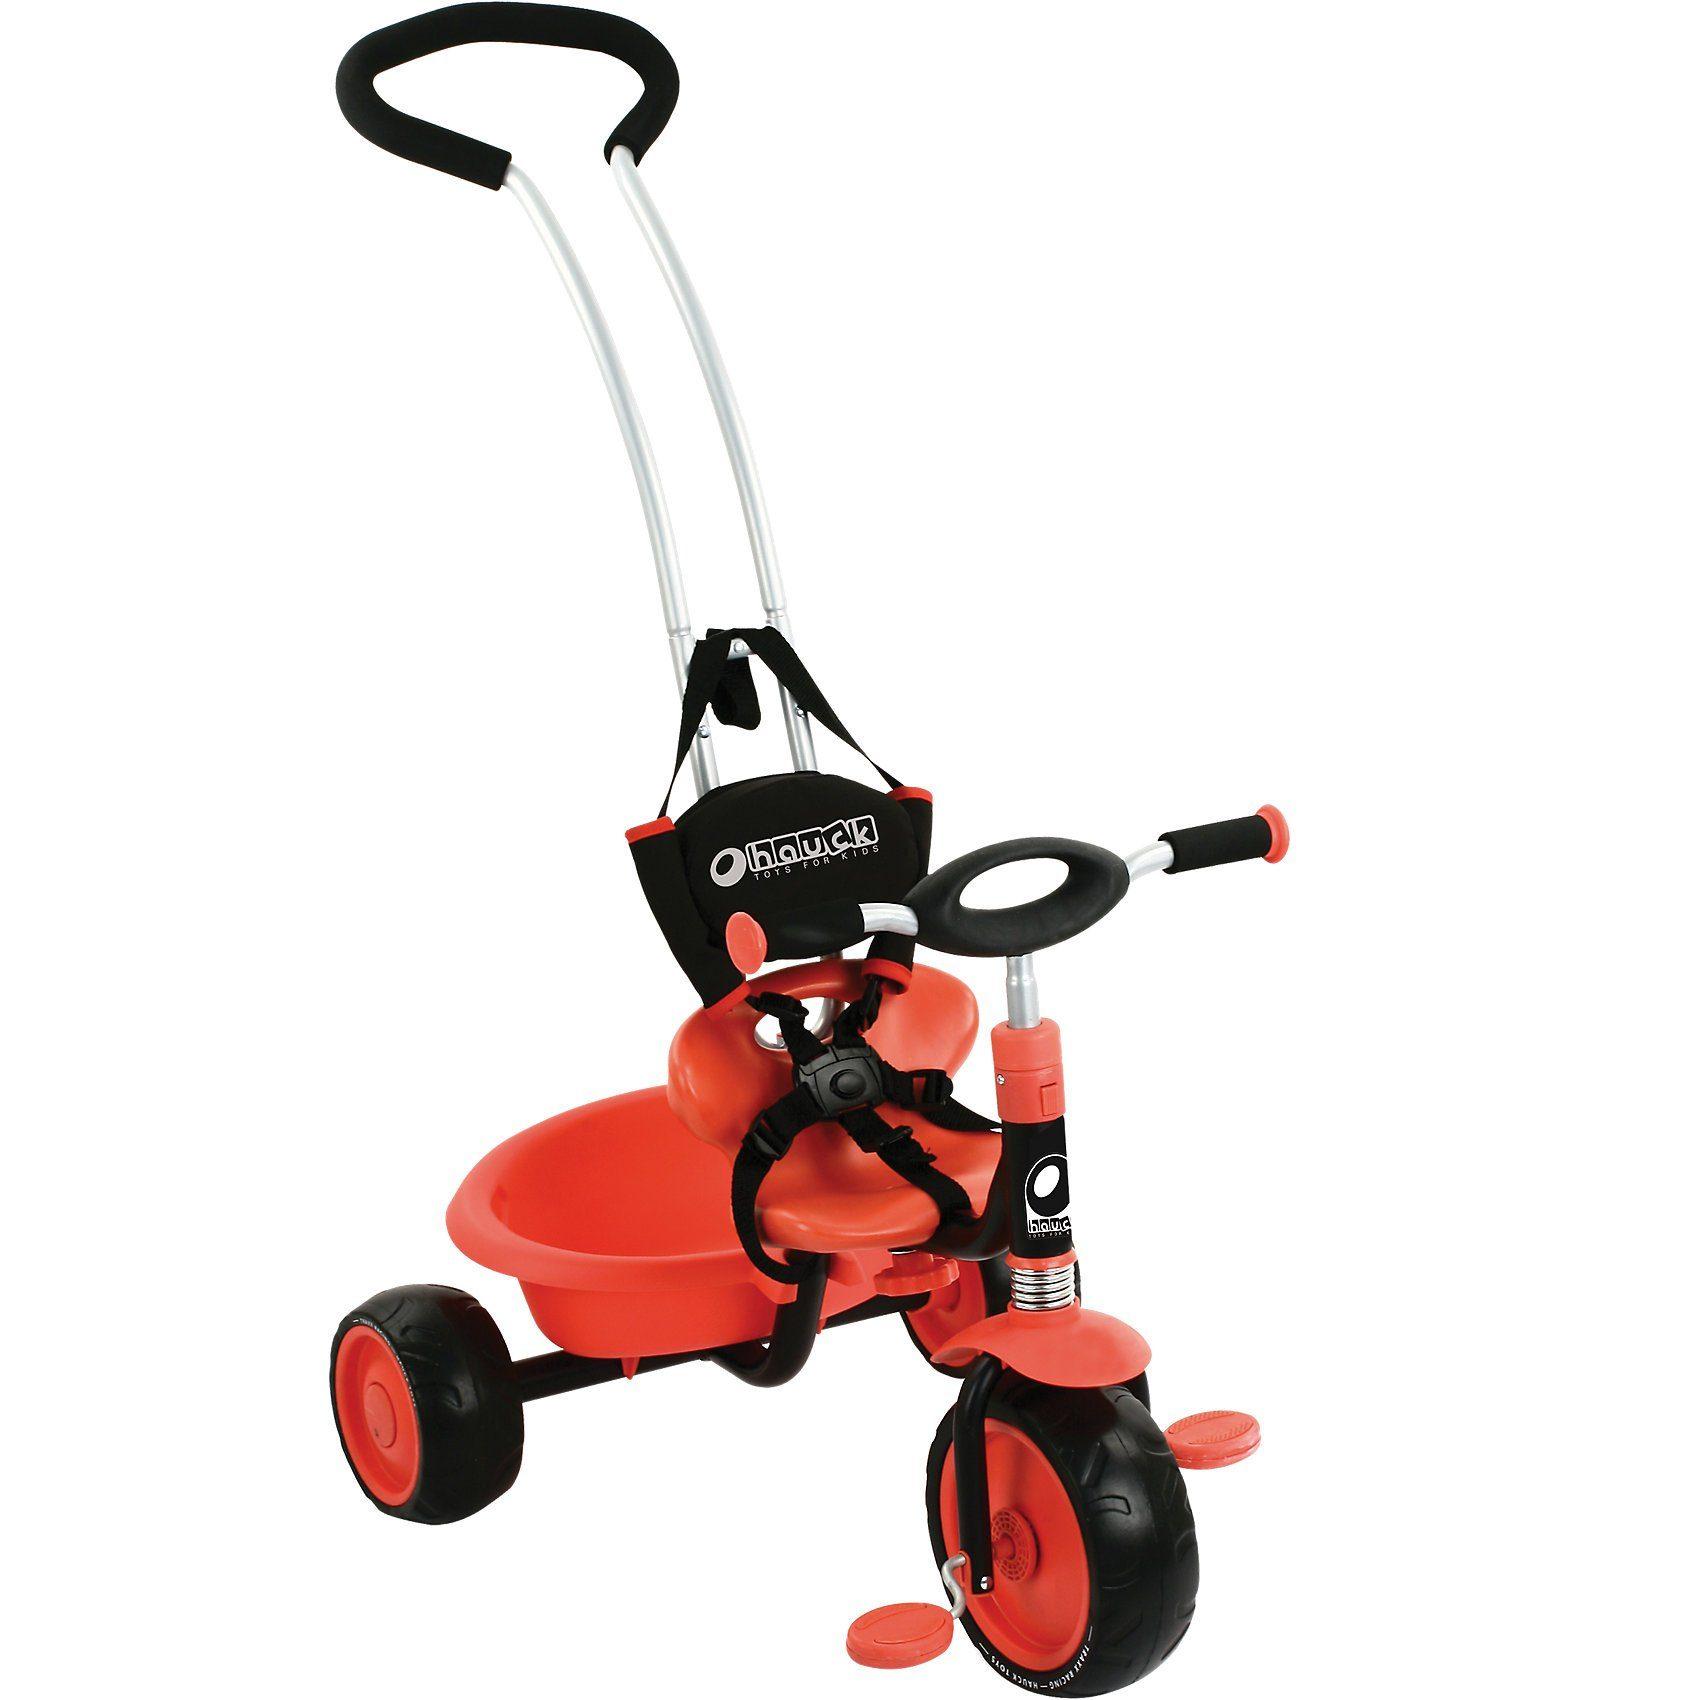 hauck Toys Dreirad Prema, rot